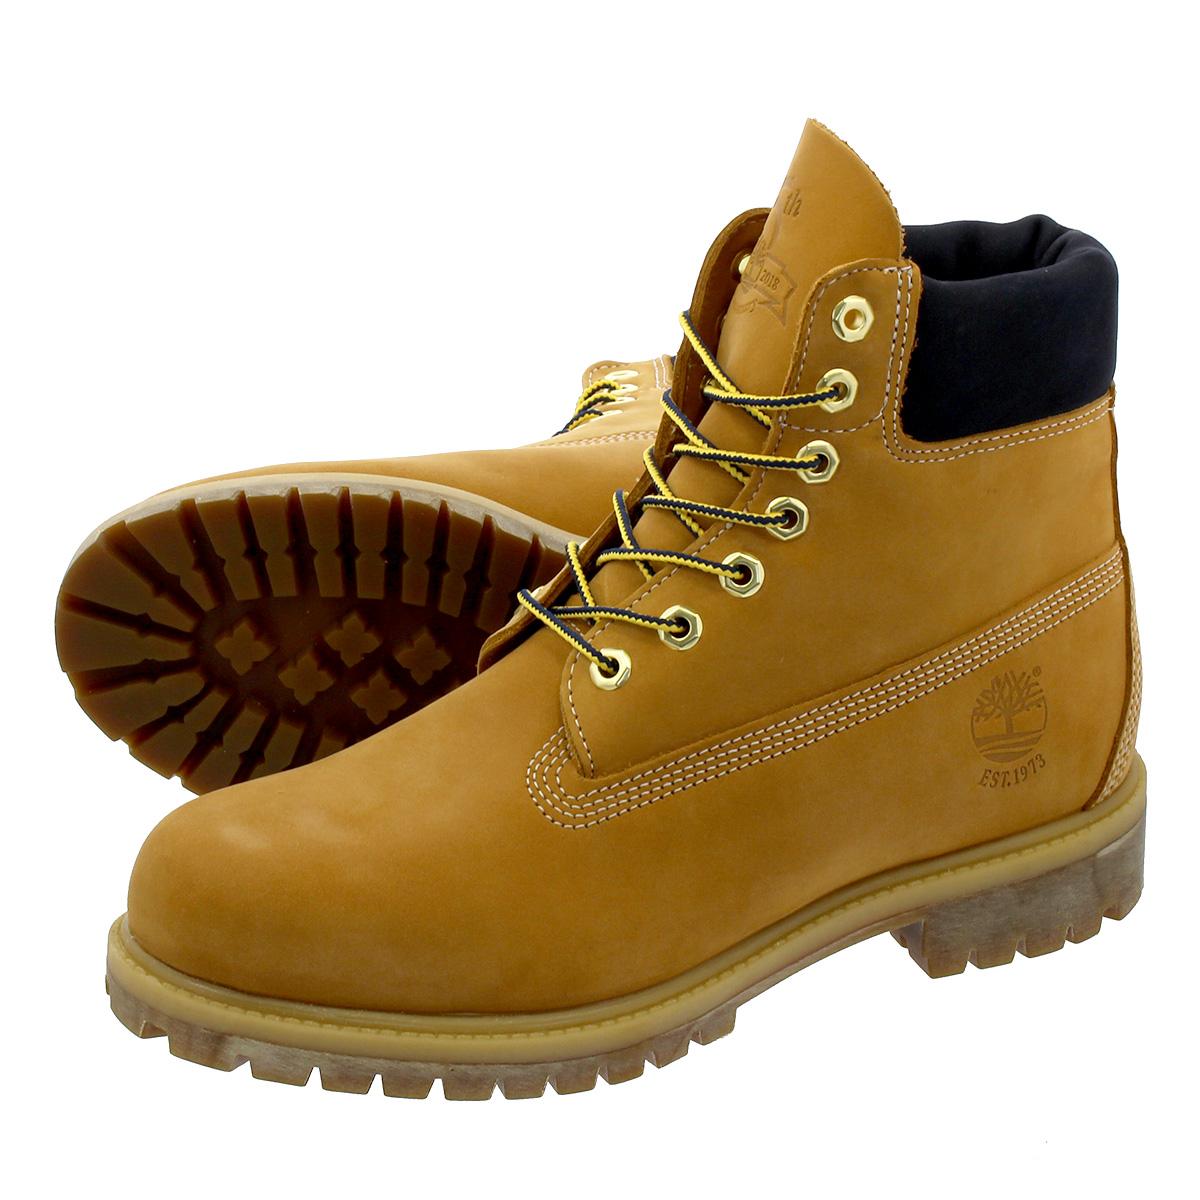 TIMBERLAND 6inch PREMIUM BOOTS 【45th ANNIVERSARY】 ティンバーランド 6インチ プレミアム ブーツ WHEAT NUBUCK a1vxw